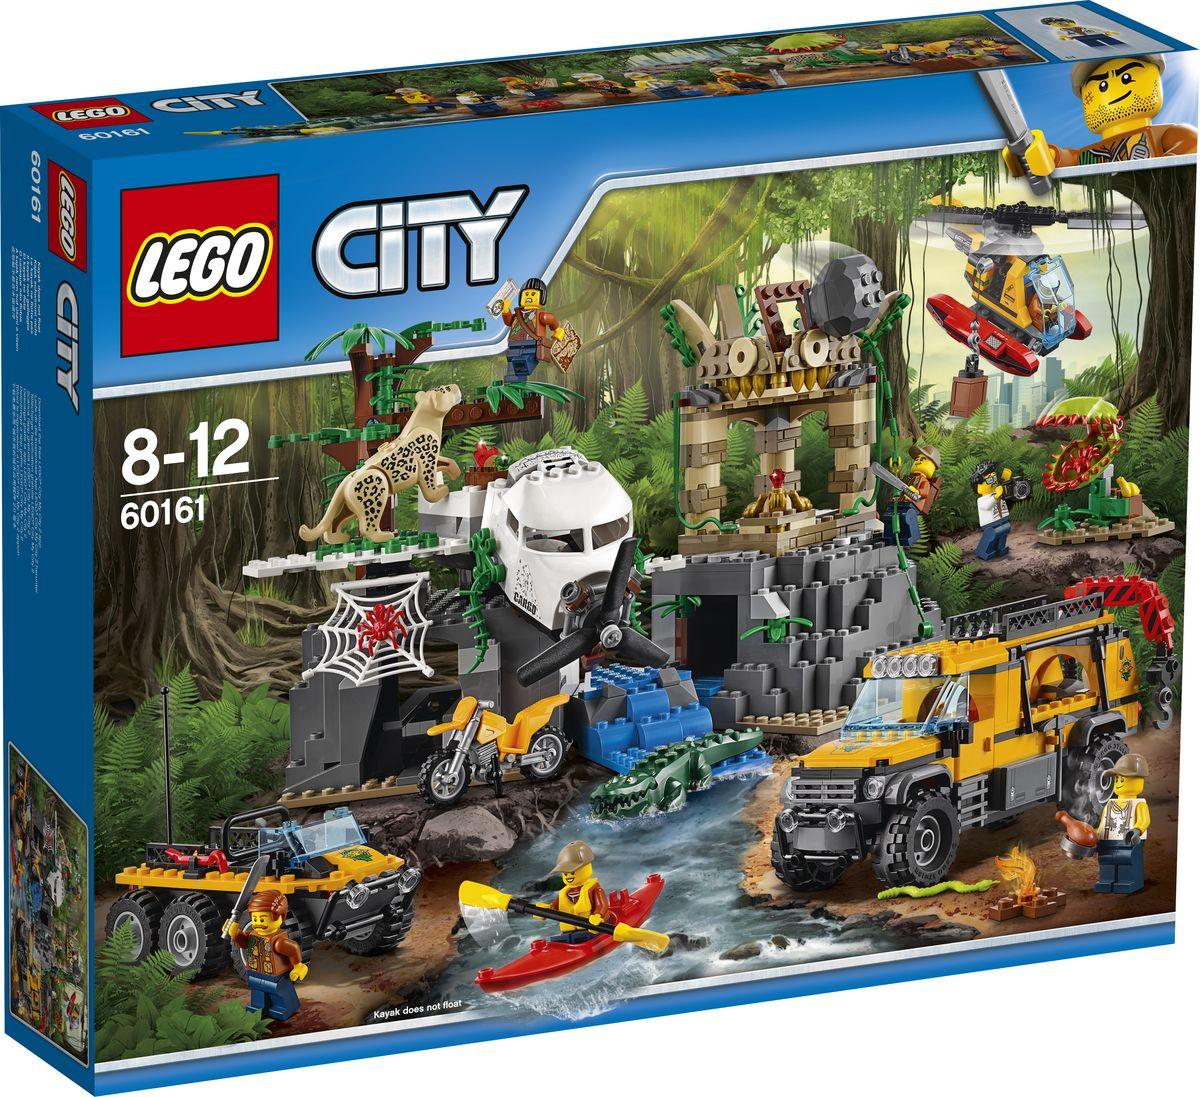 LEGO City Jungle Explorer Конструктор База исследователей джунглей 60161 конструкторы lego lego city jungle explorer база исследователей джунглей 60161